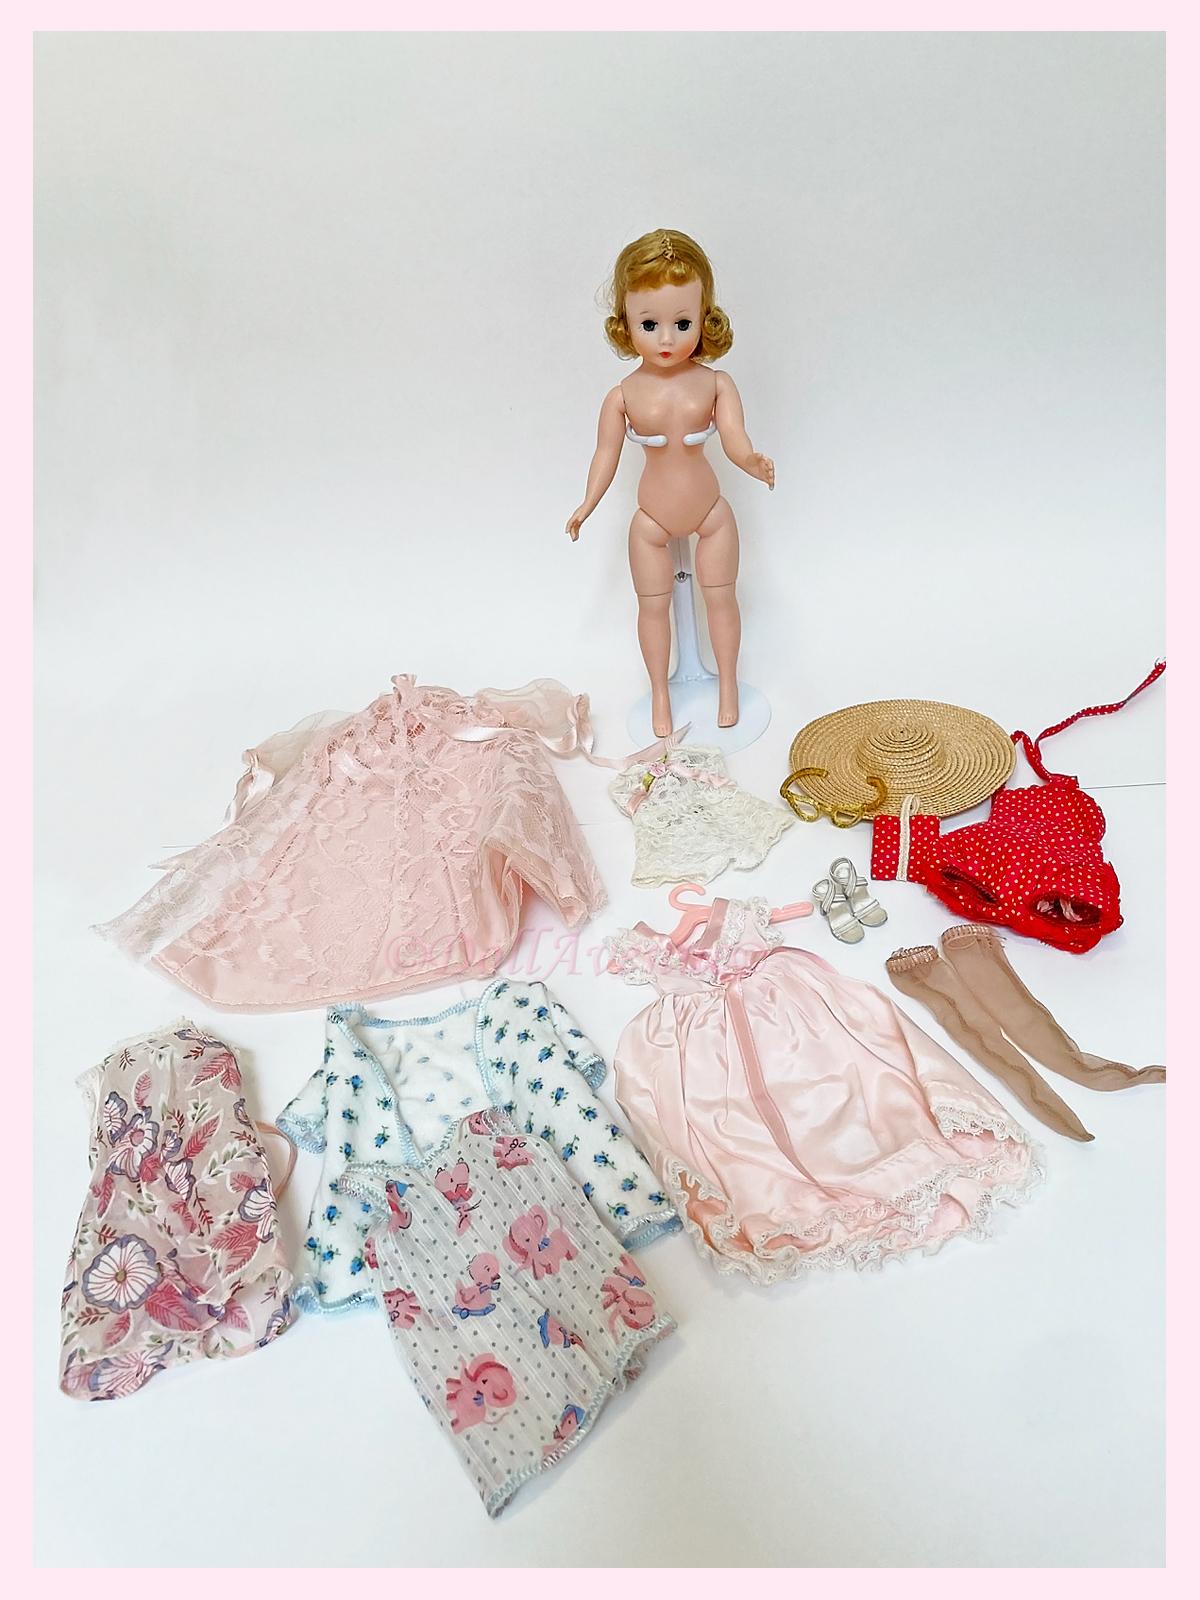 Vintage Blonde Cissette/Clothing Lot